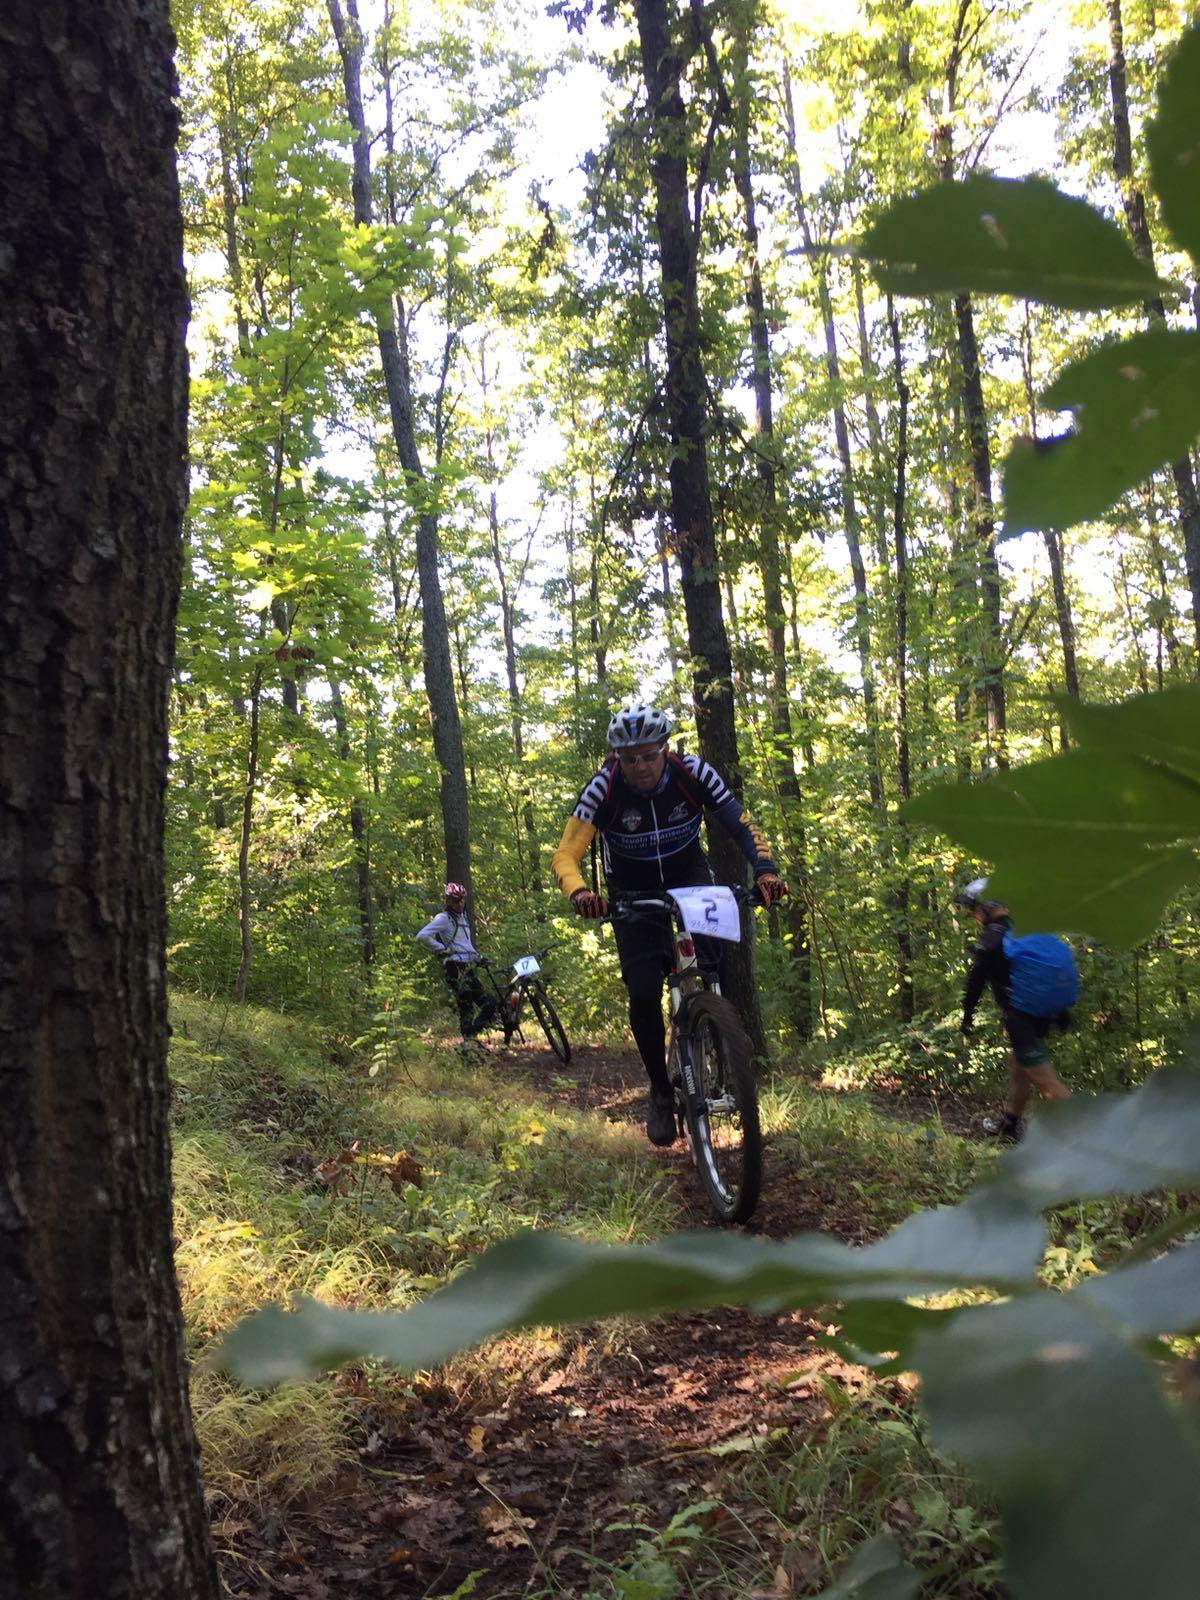 2 Ottobre 2021 – Lezione di mountain bike ed ebike per adulti